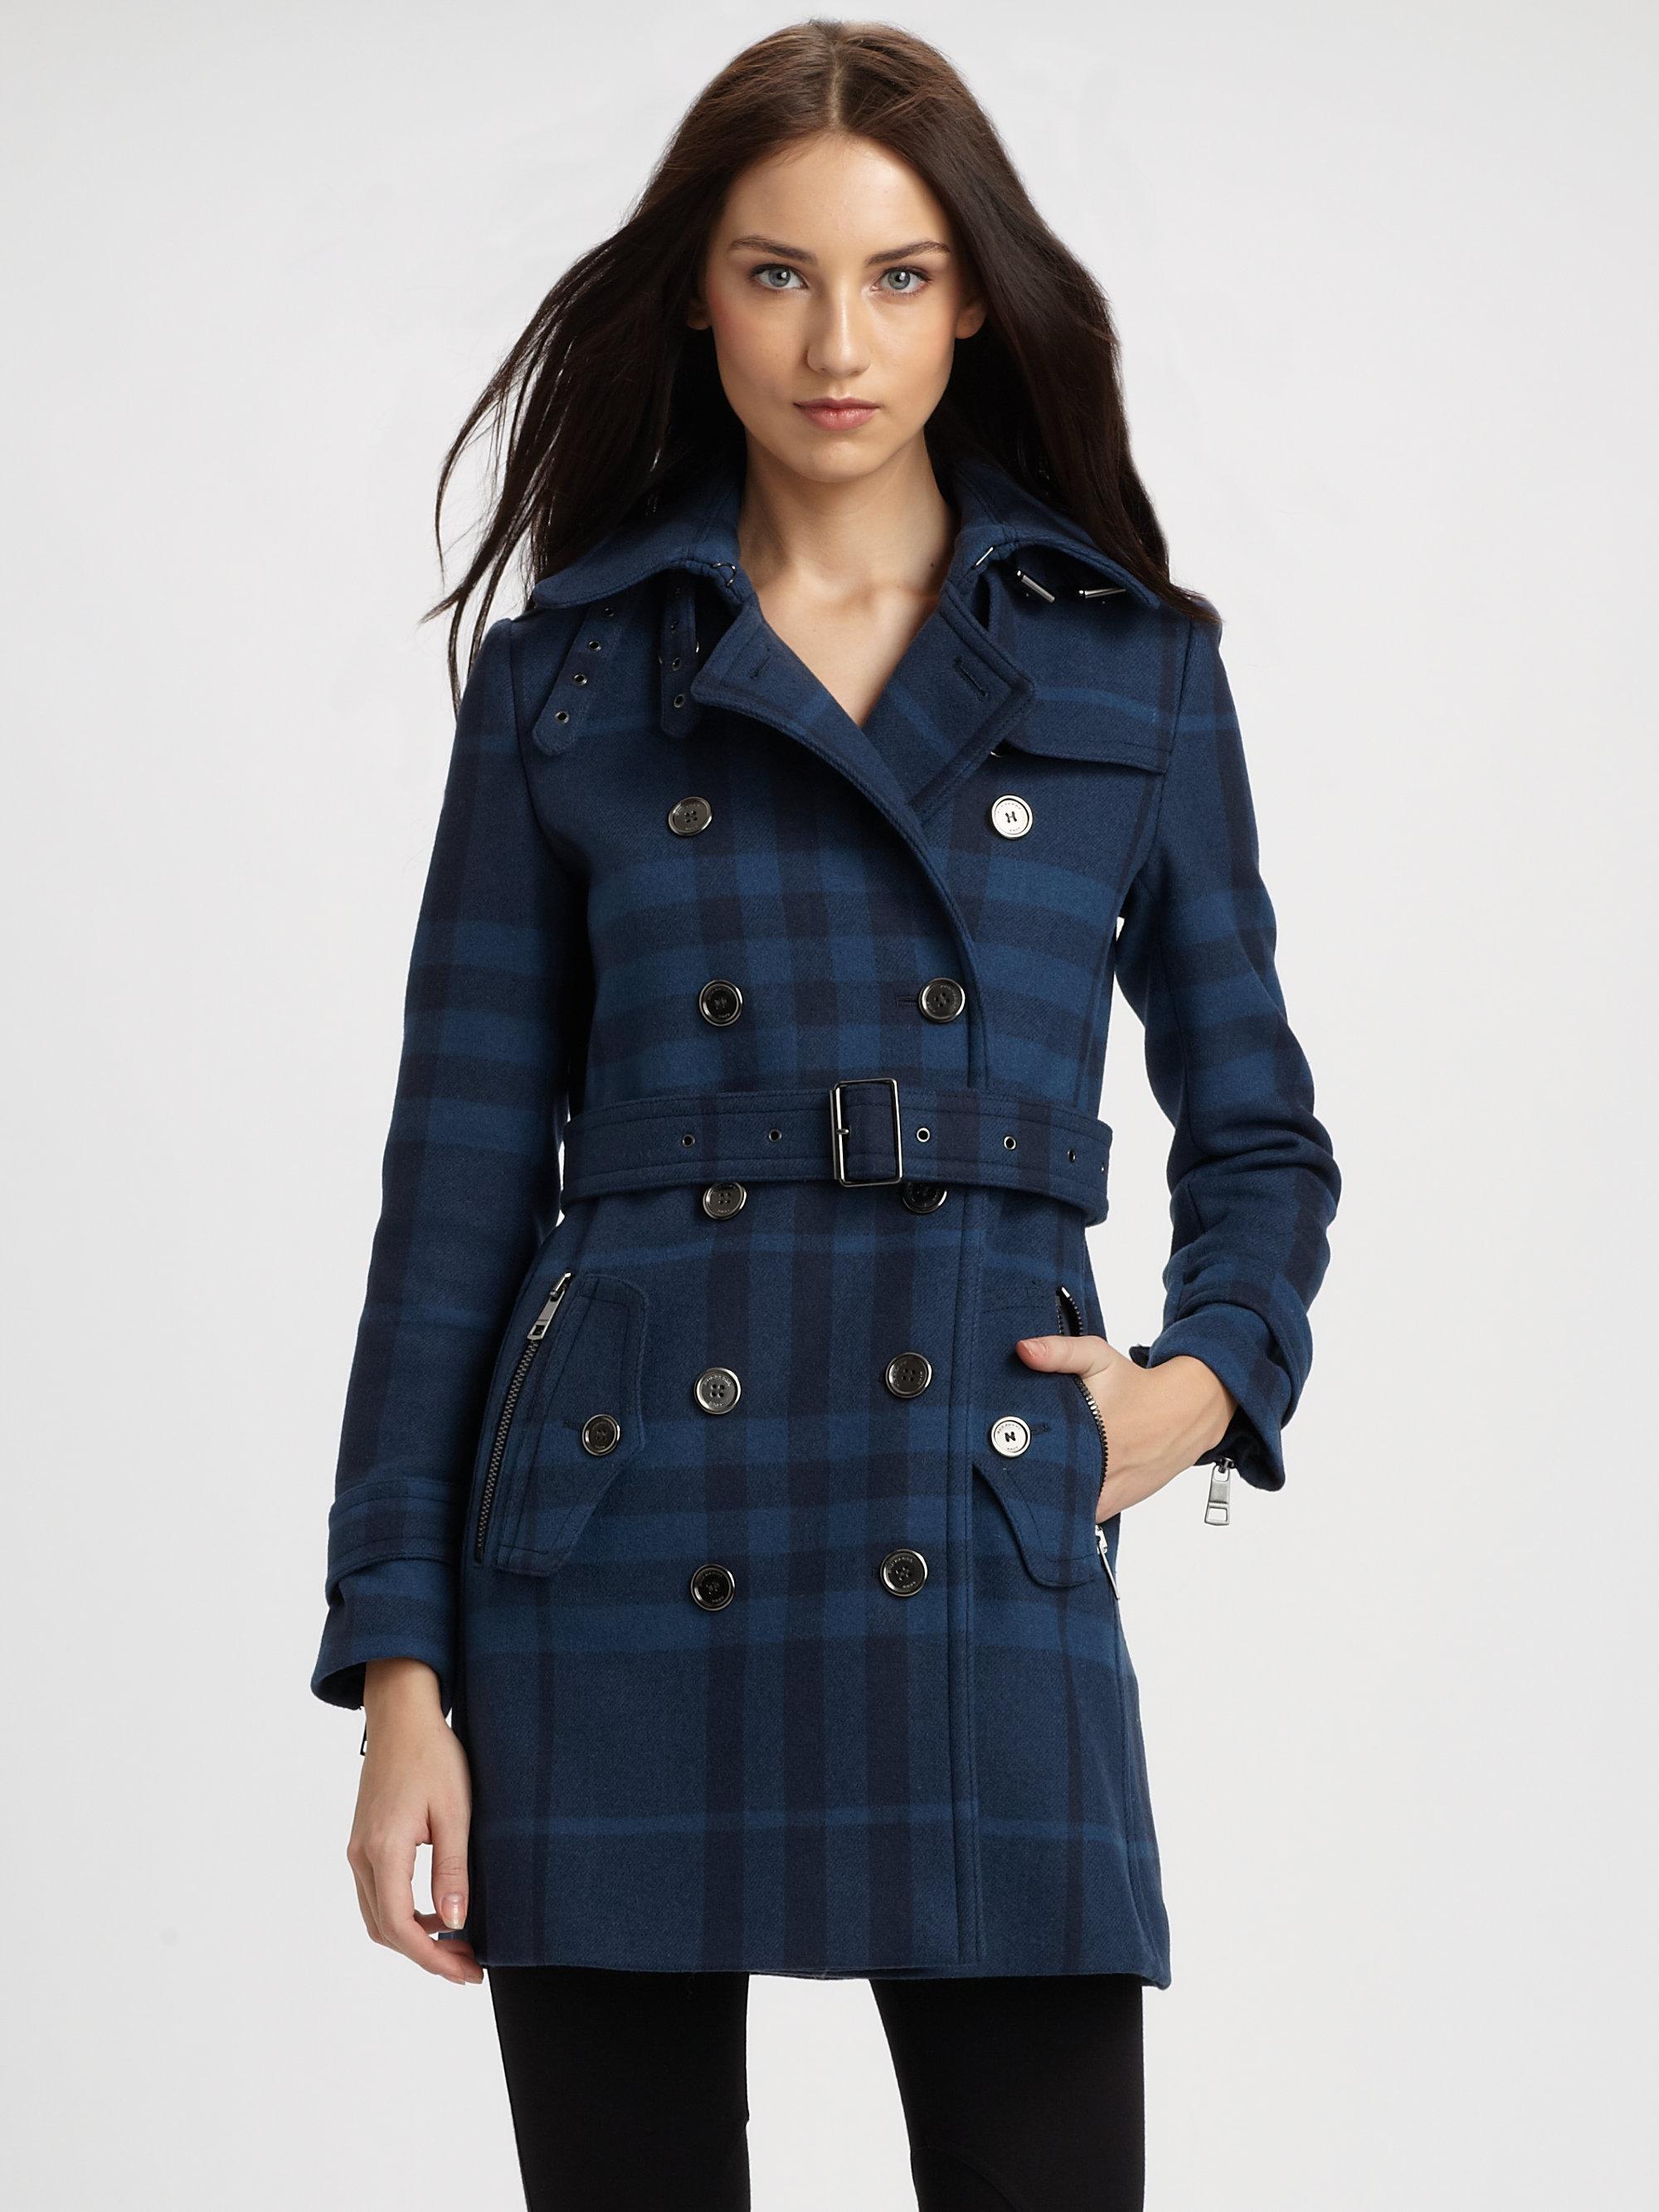 Lyst Burberry Brit Plaid Wool Blend Coat In Blue